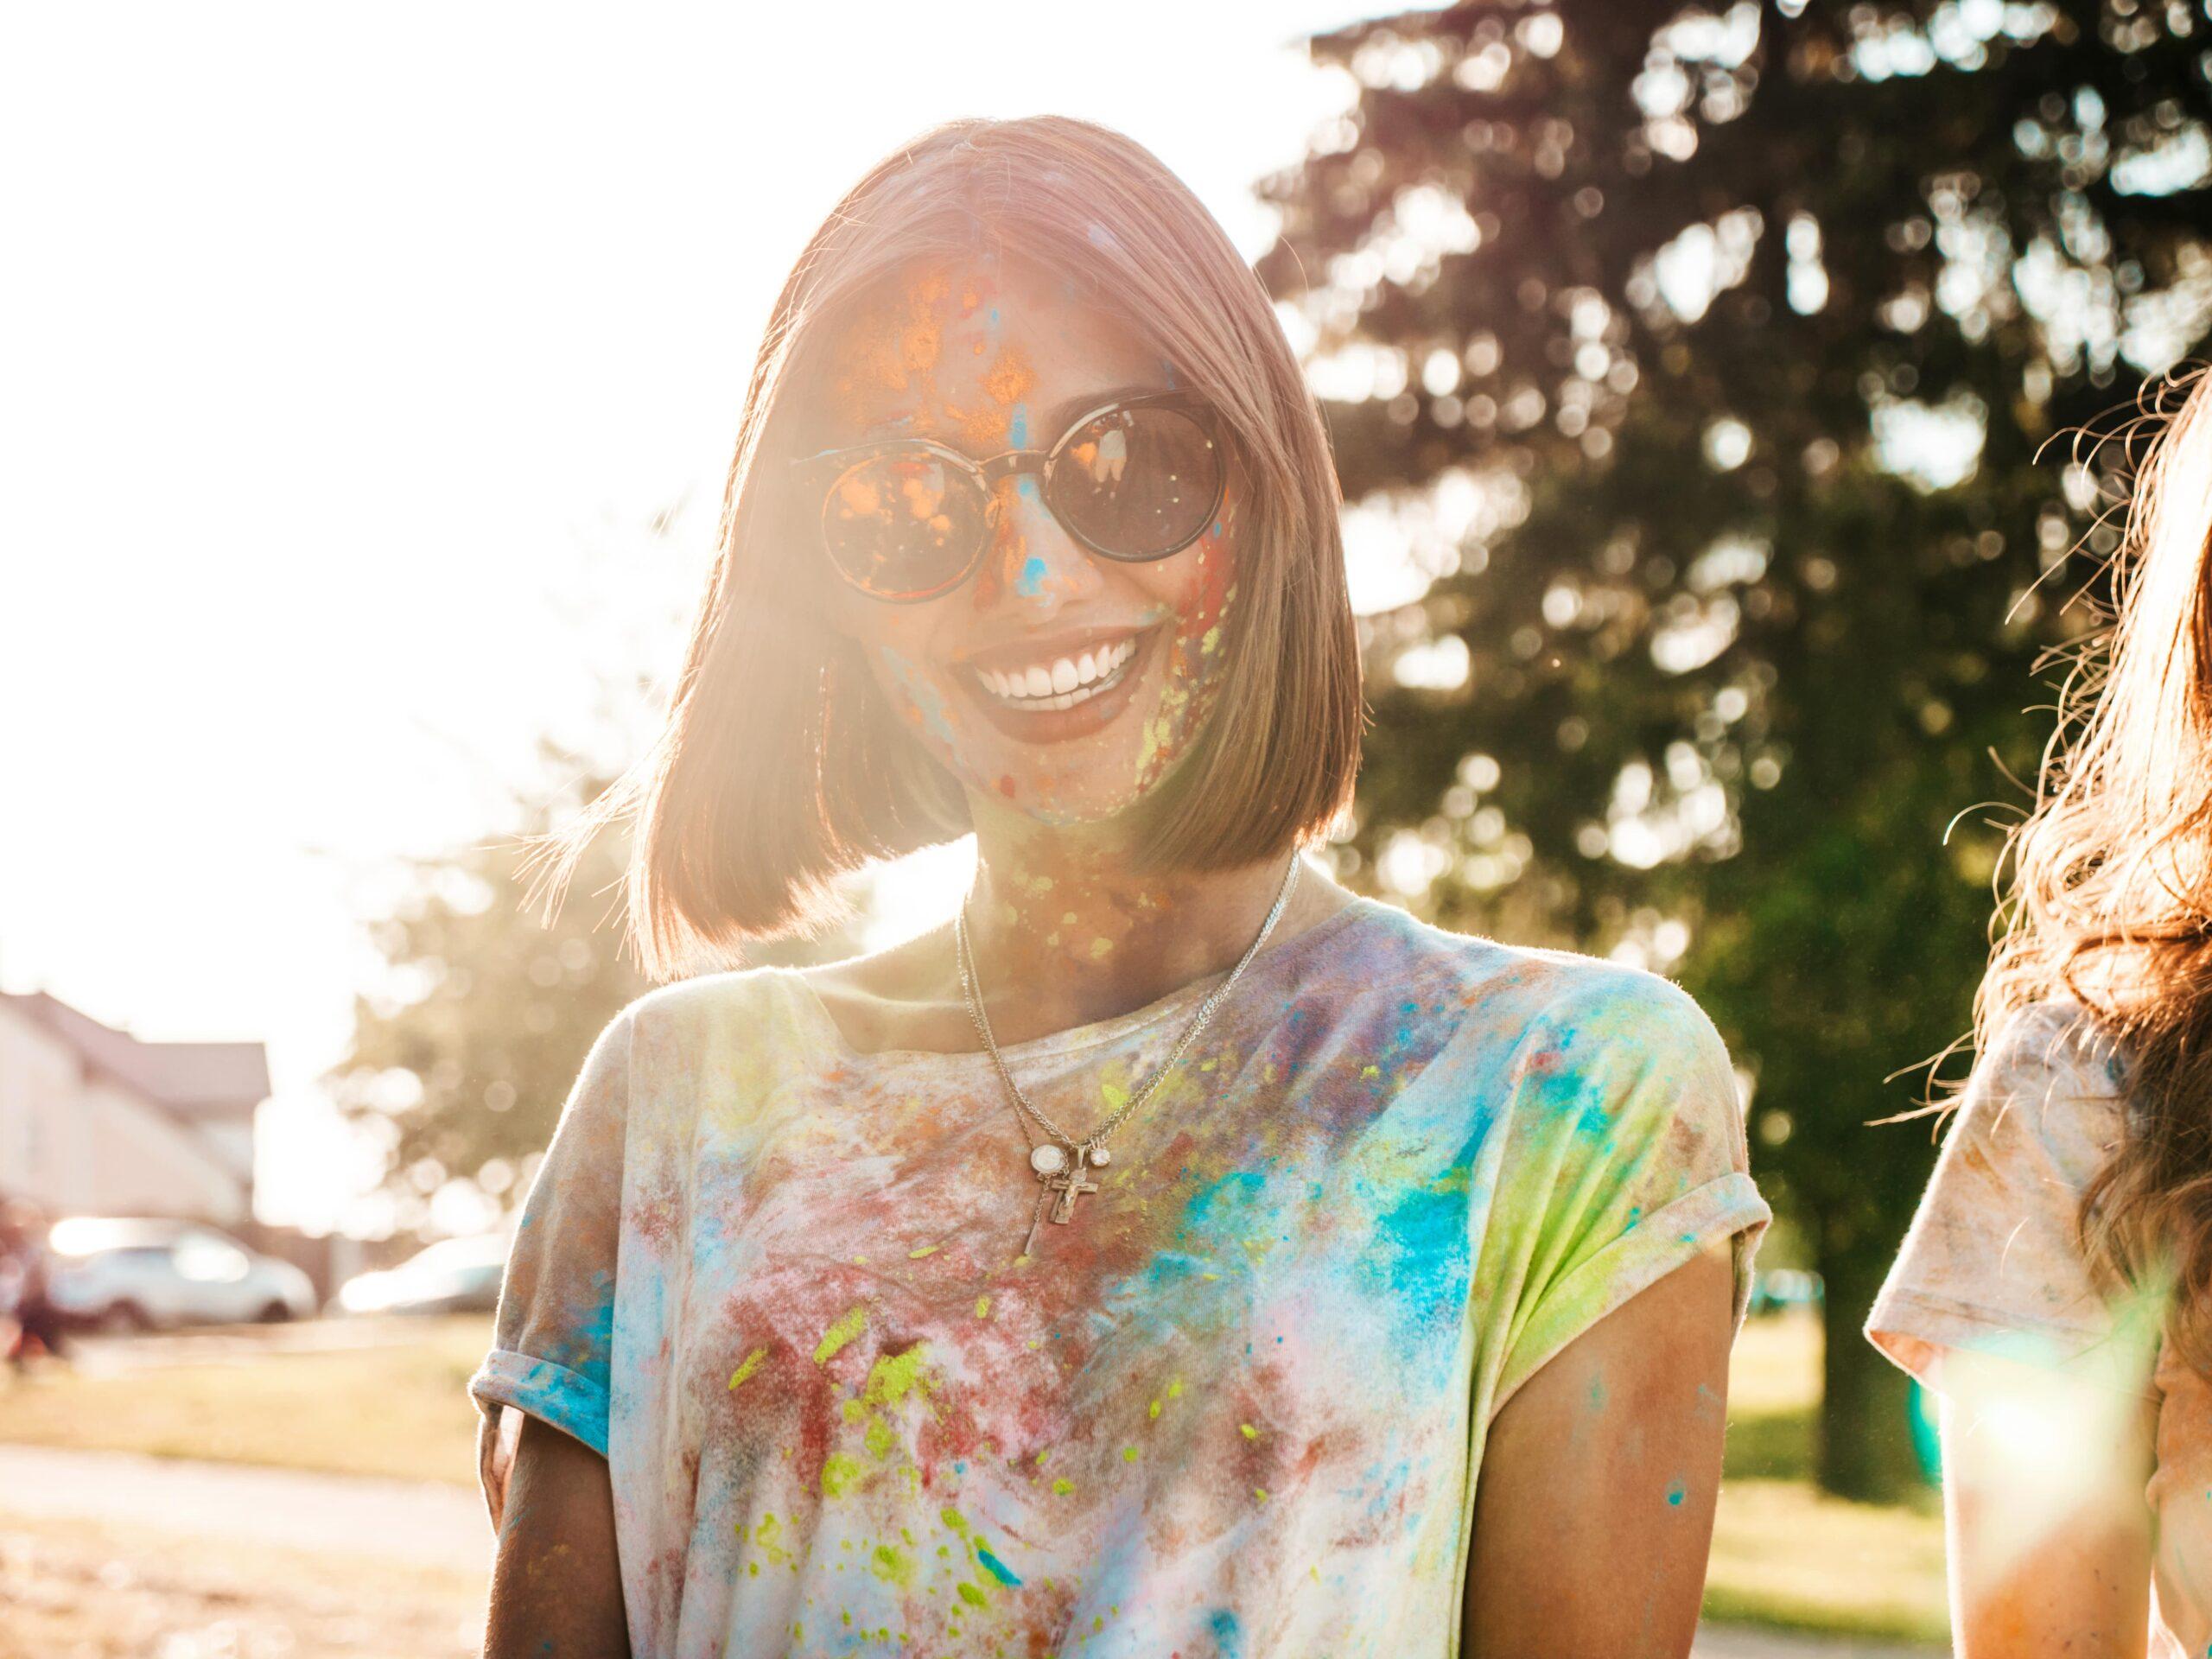 portrait of young beautiful woman posing outdoors tzt9l7b min